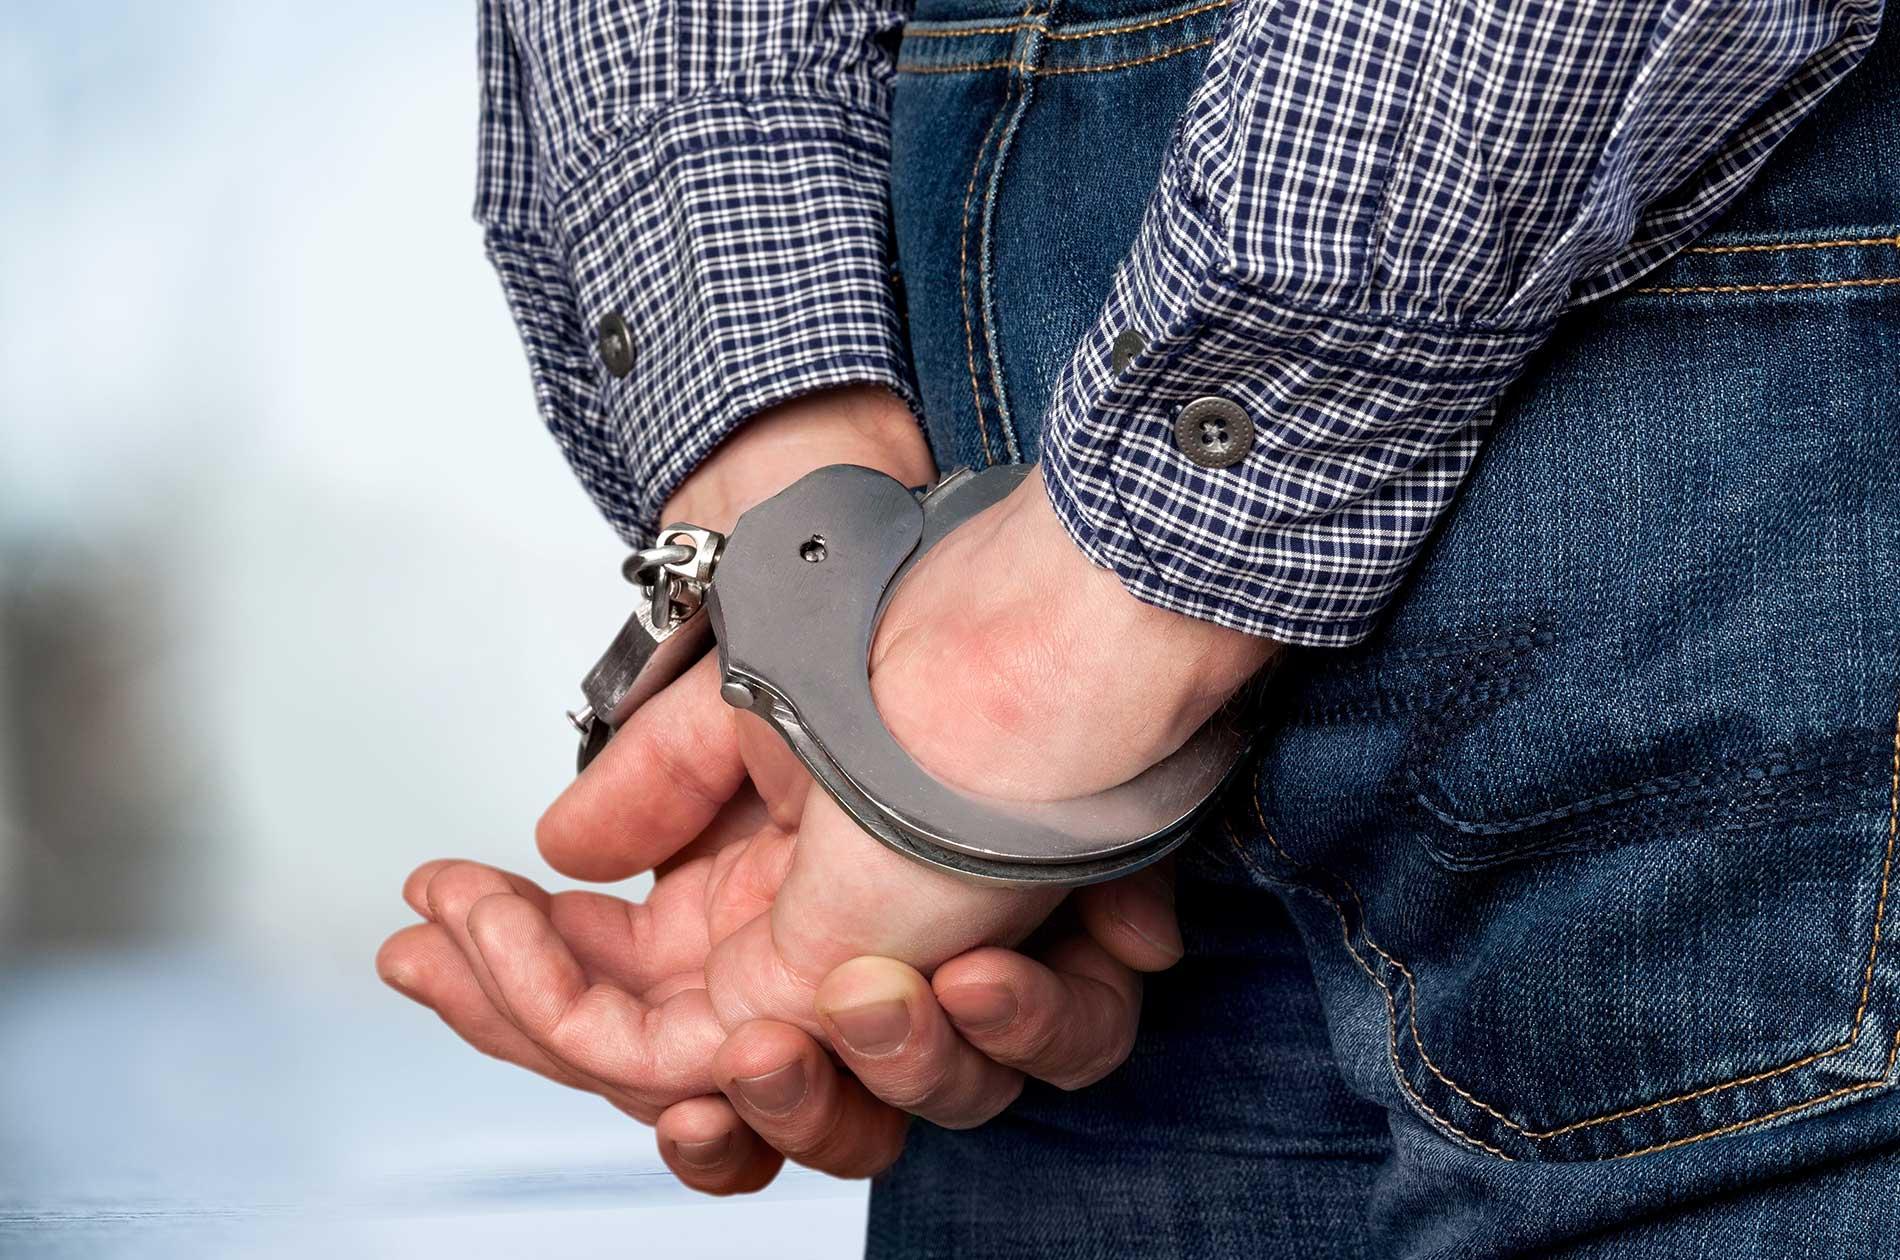 A man in handcuffs